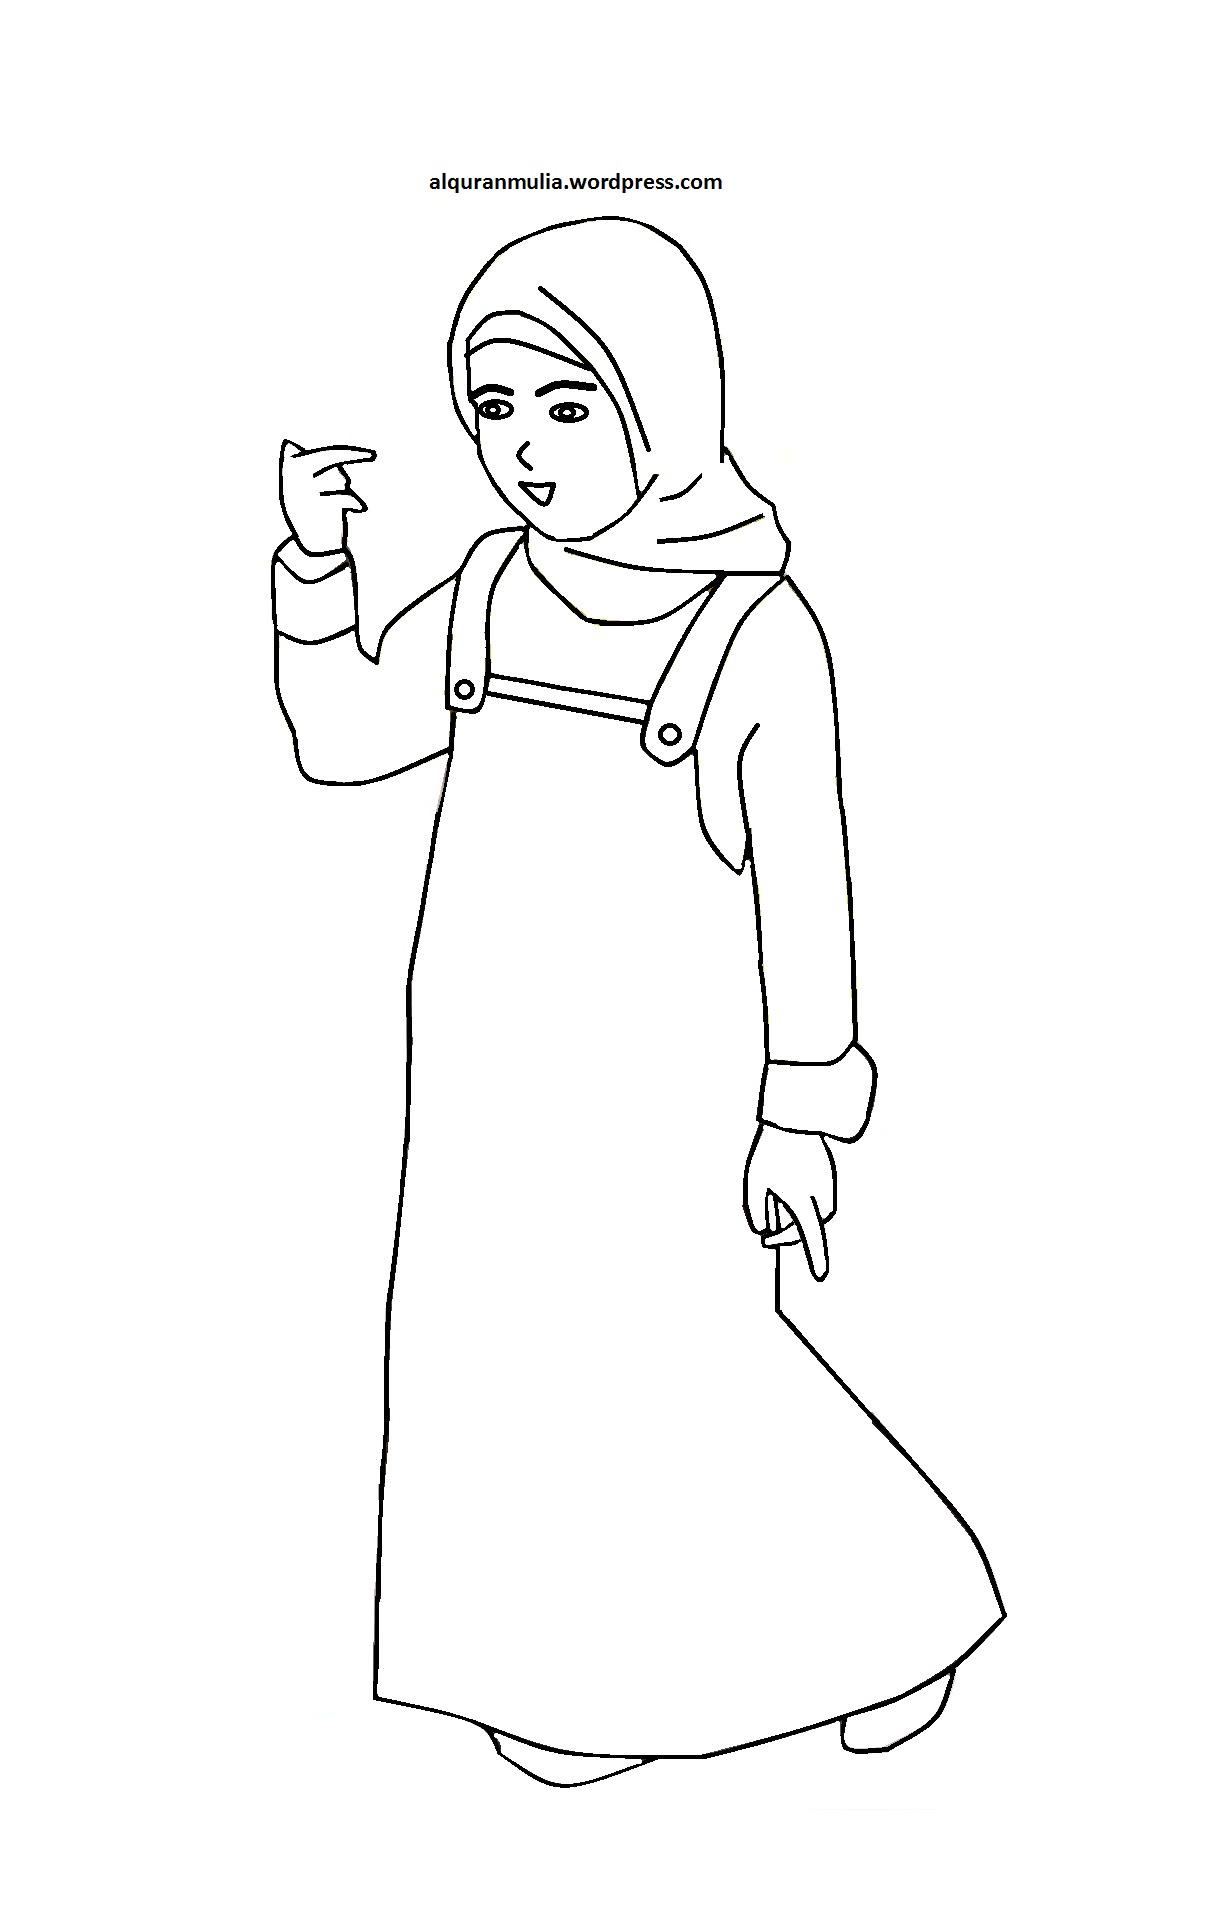 Download 31 Gambar Mewarnai Anak Muslim Auto Electrical Wiring Diagram